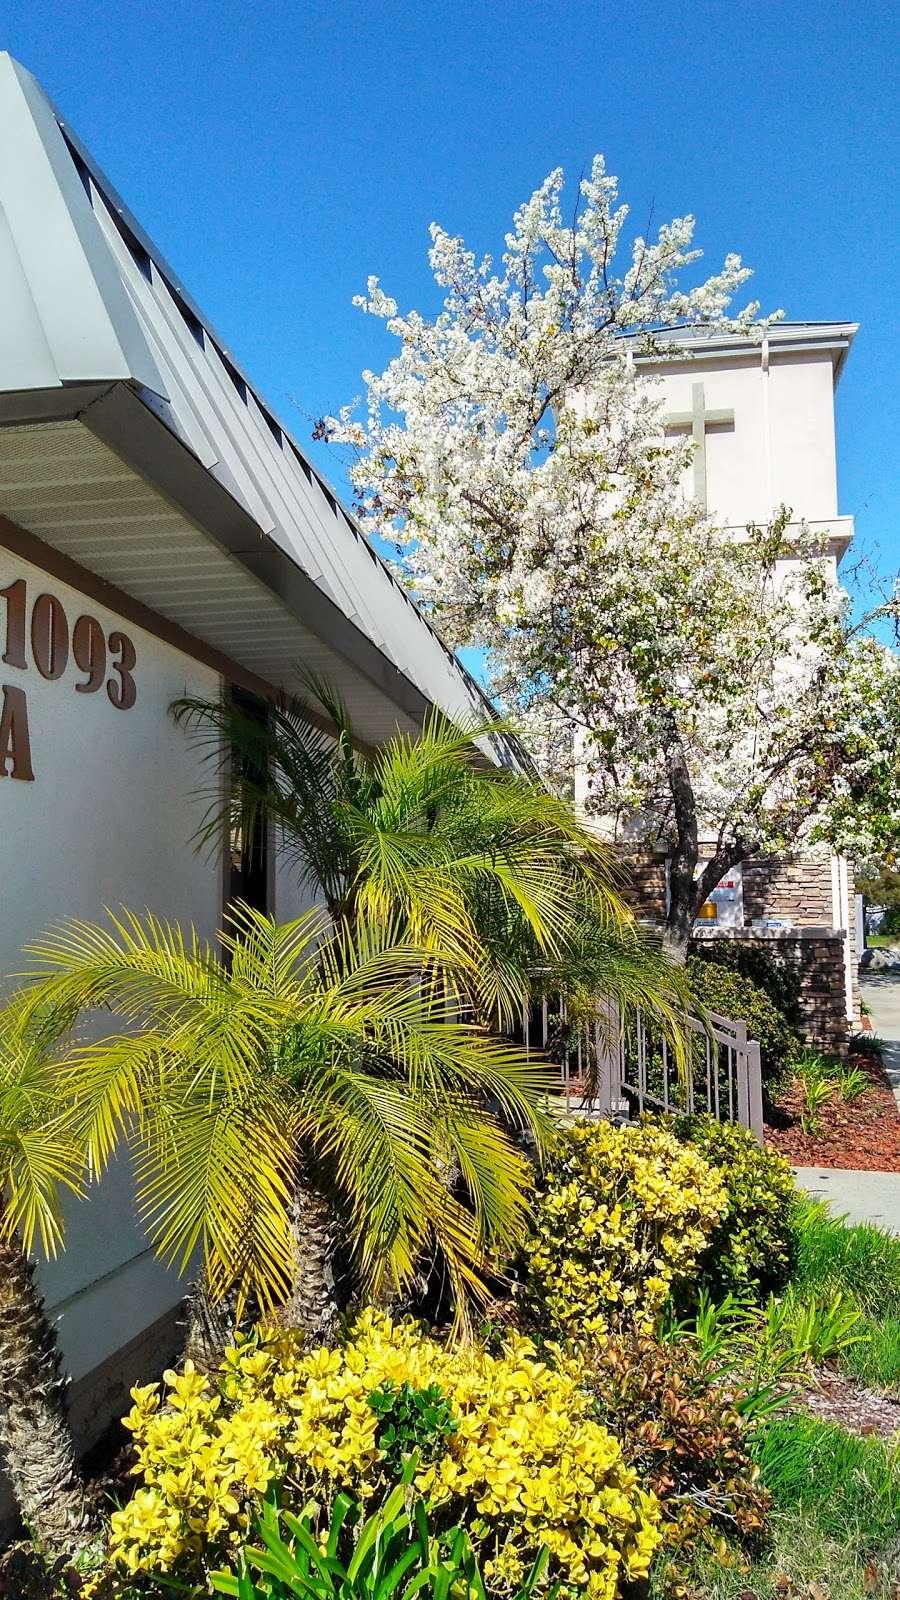 Woodland Park Bible Church - church  | Photo 5 of 9 | Address: 1093 Rock Springs Rd, San Marcos, CA 92069, USA | Phone: (760) 744-9242